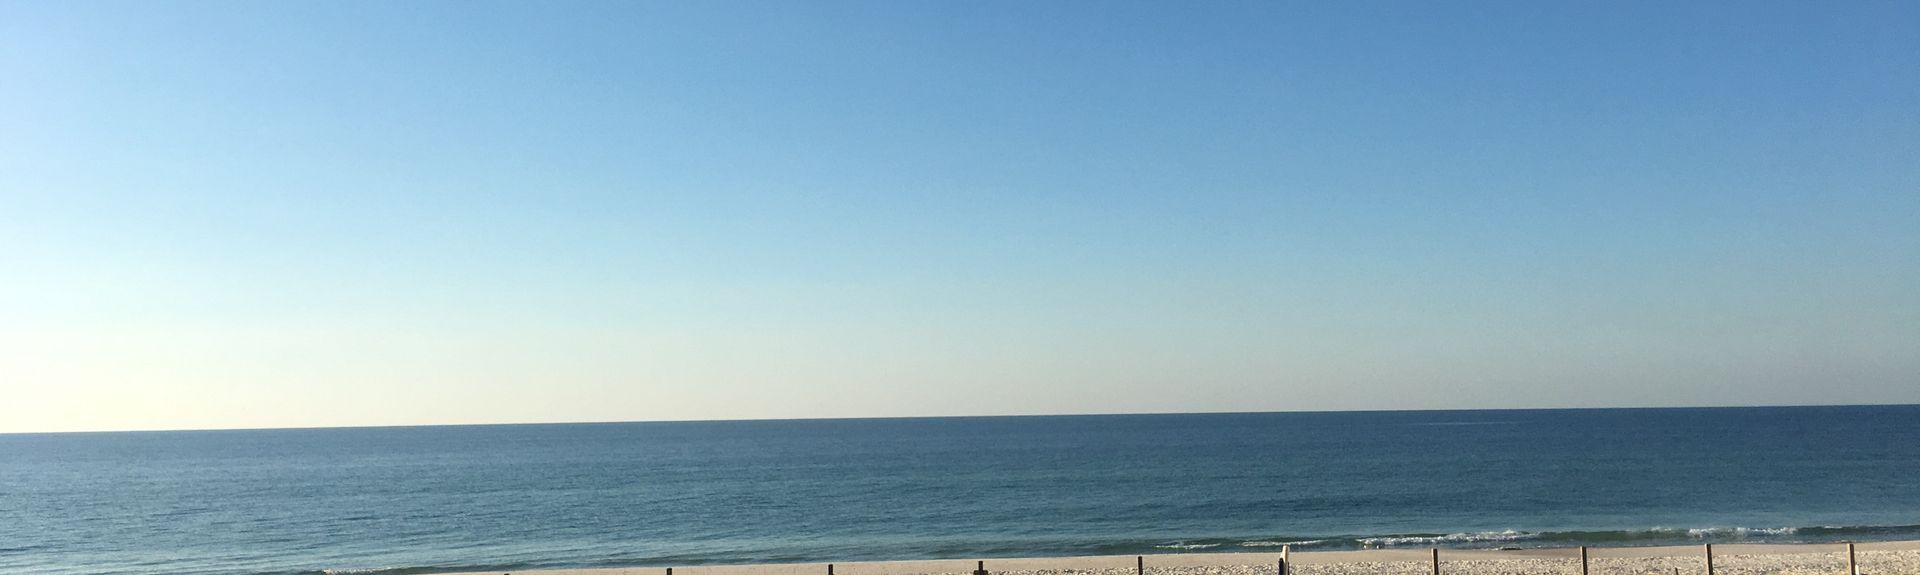 Tropical Winds, Gulf Shores, AL, USA